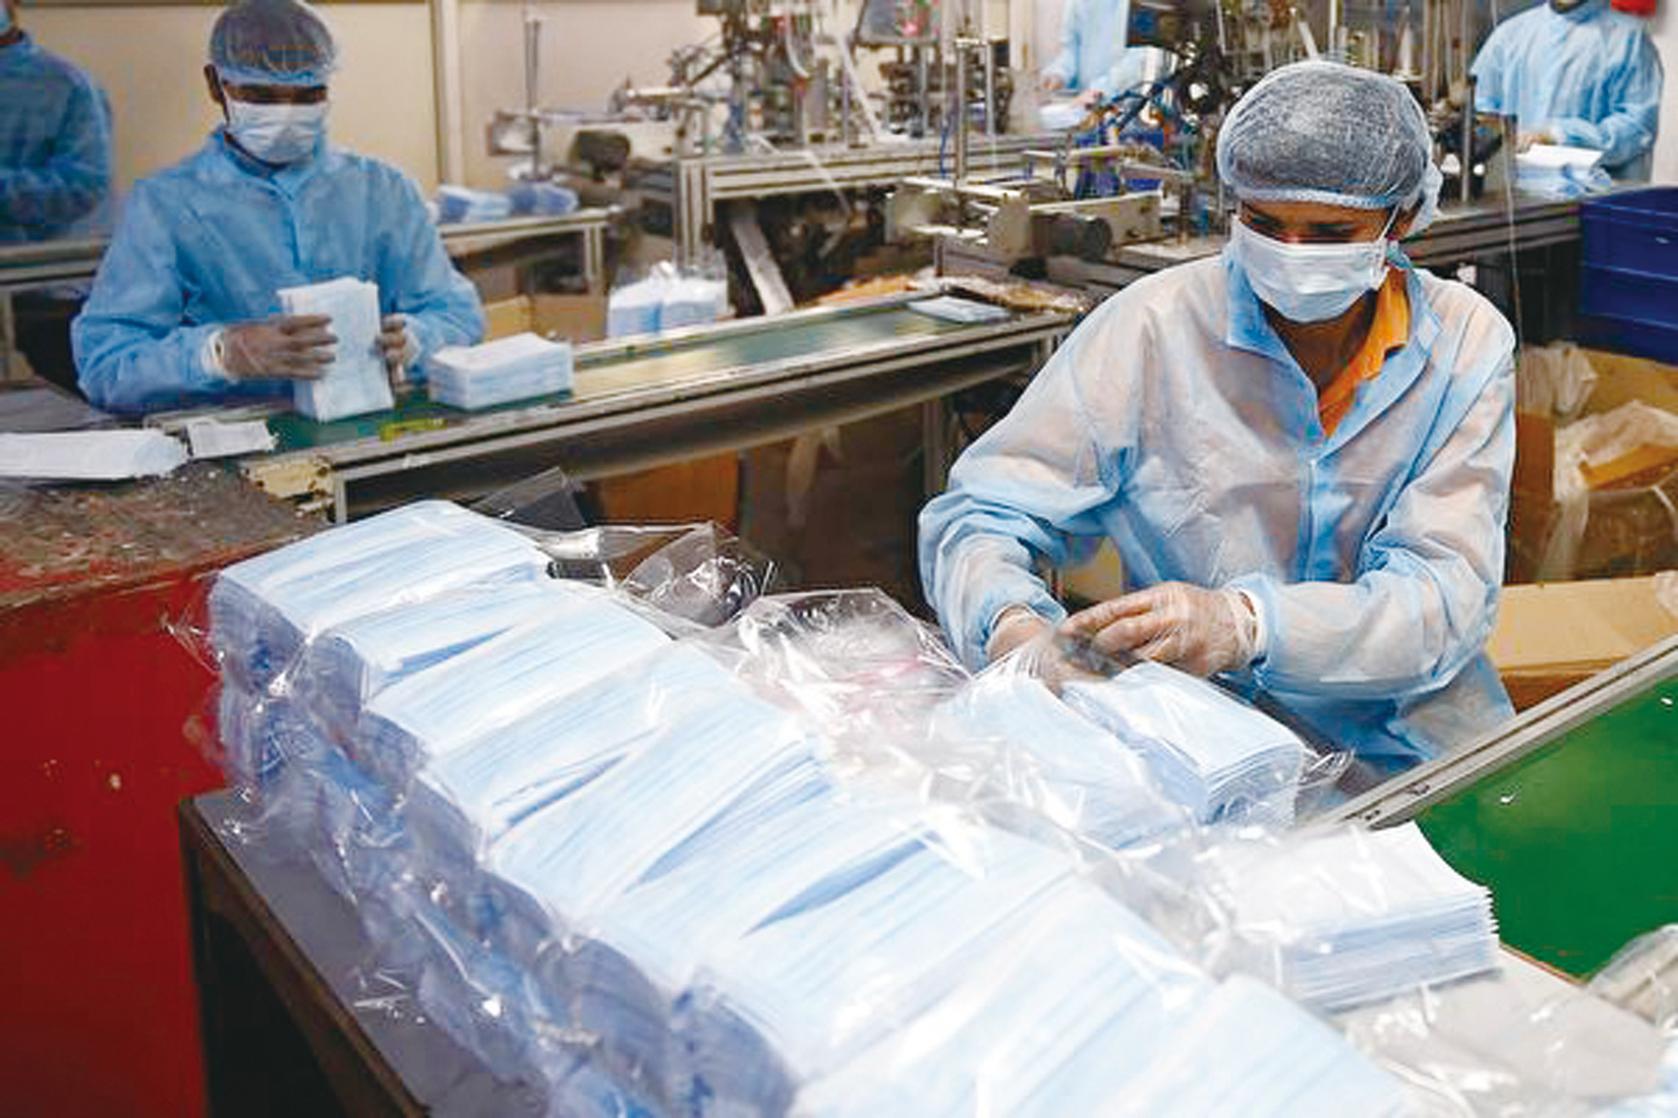 瘟疫重創大陸經濟,商店關門,工廠停工。口罩短缺,很多工廠不能開工。圖為示意圖。 (SAM PANTHAKY/AFP via Getty Images) (Getty Images)